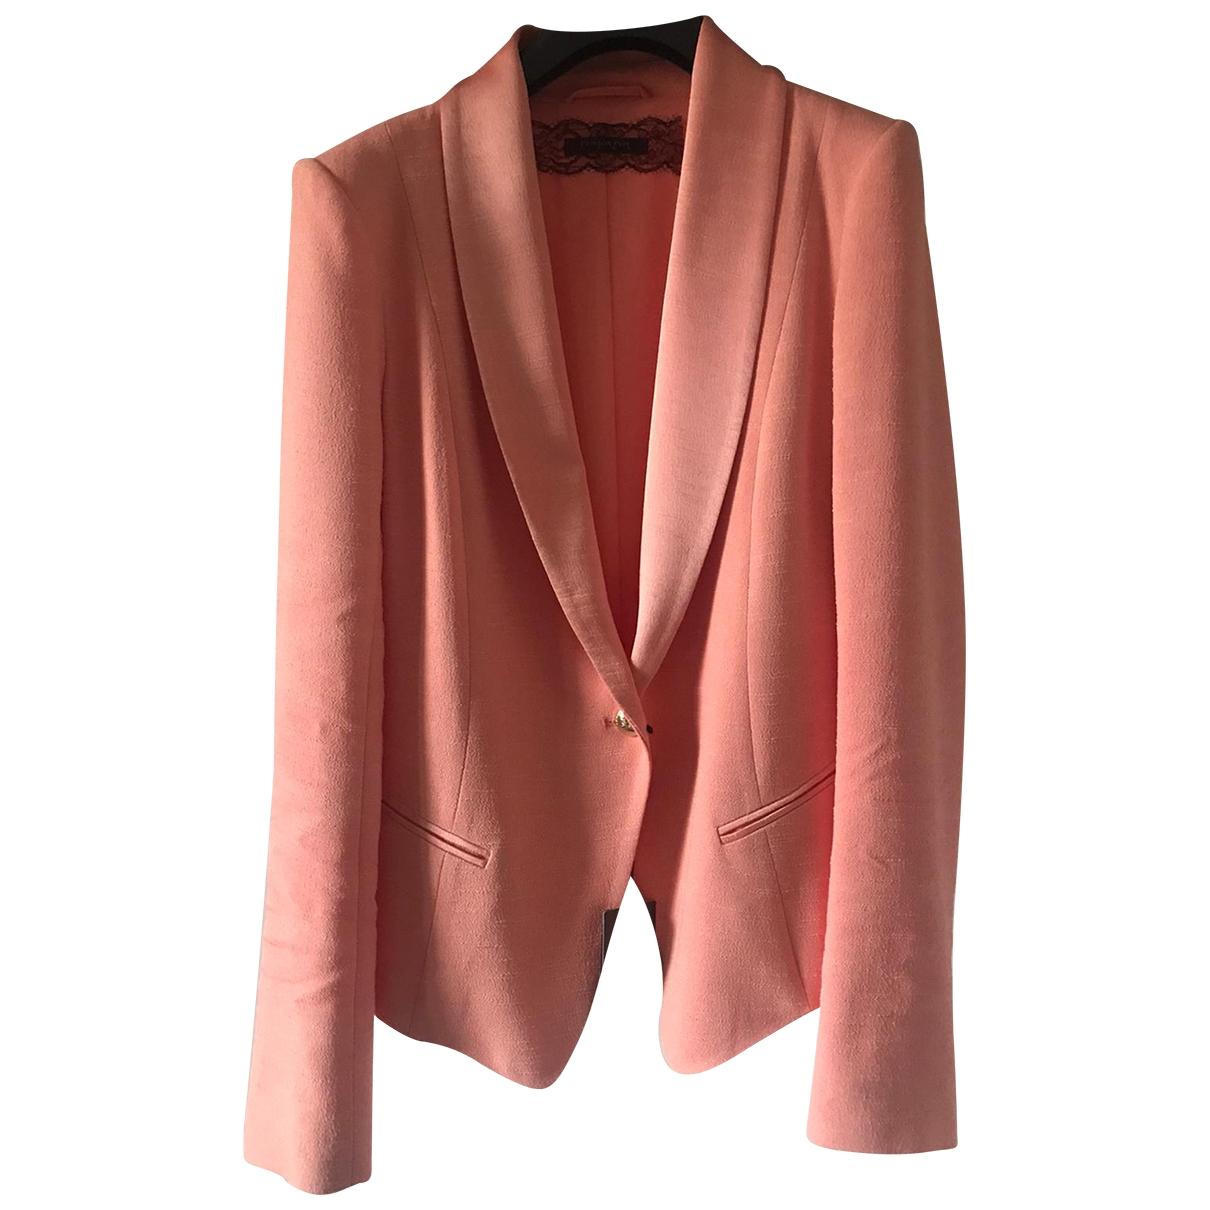 Patrizia Pepe \N Pink jacket for Women 42 IT